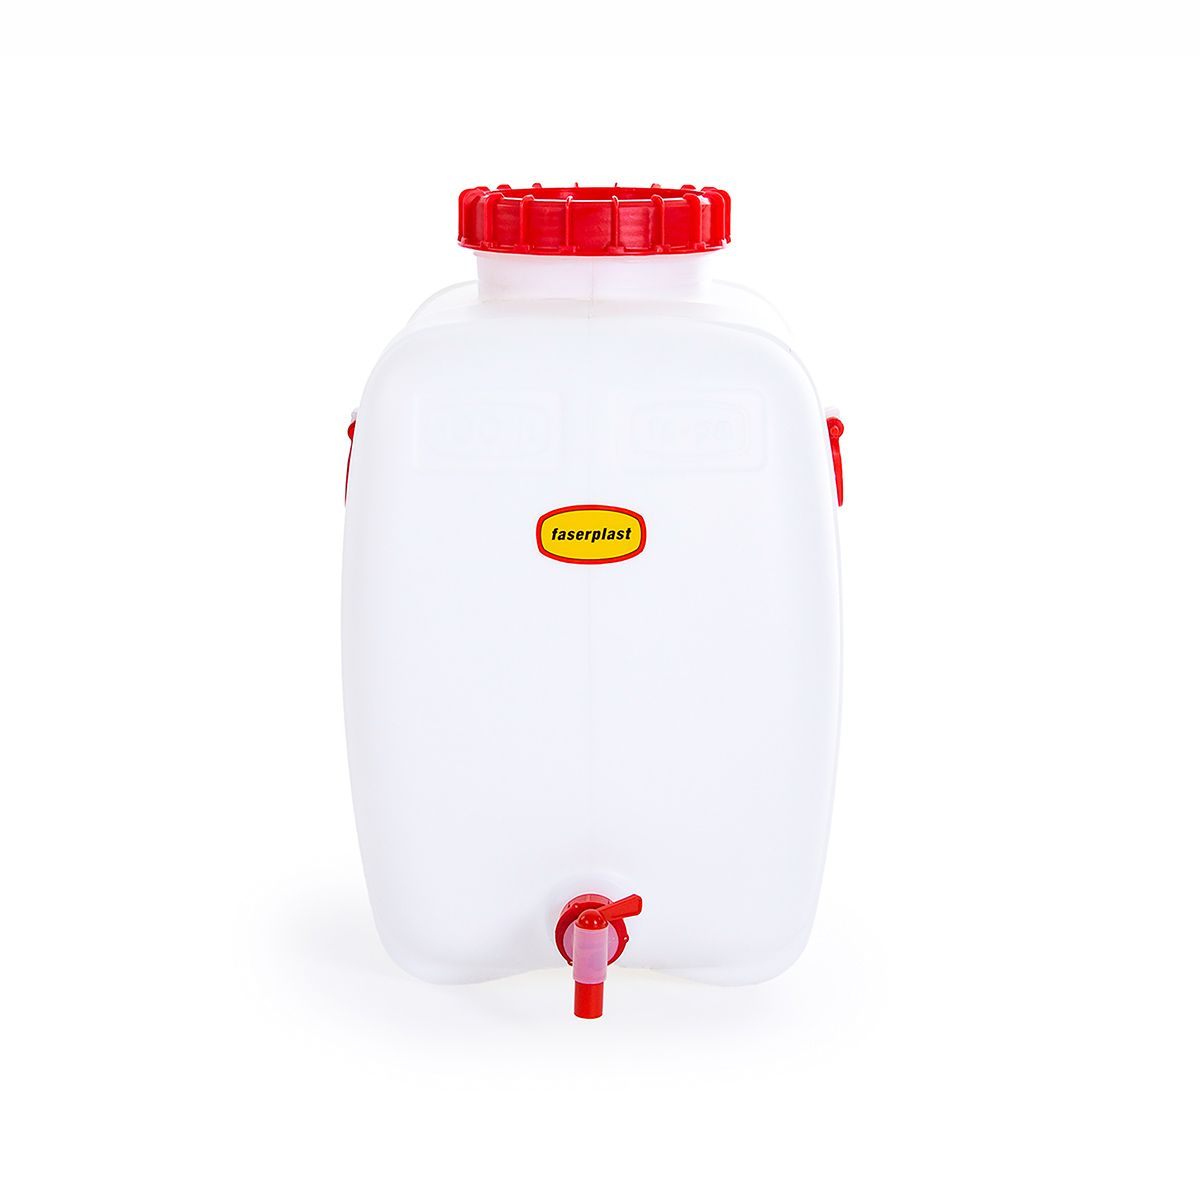 Getränkefass FAPA mit Auslaufhahn 22 mm, aus PE-HD, weiss-rot, 100 l, 590 x 415 x 659 mm